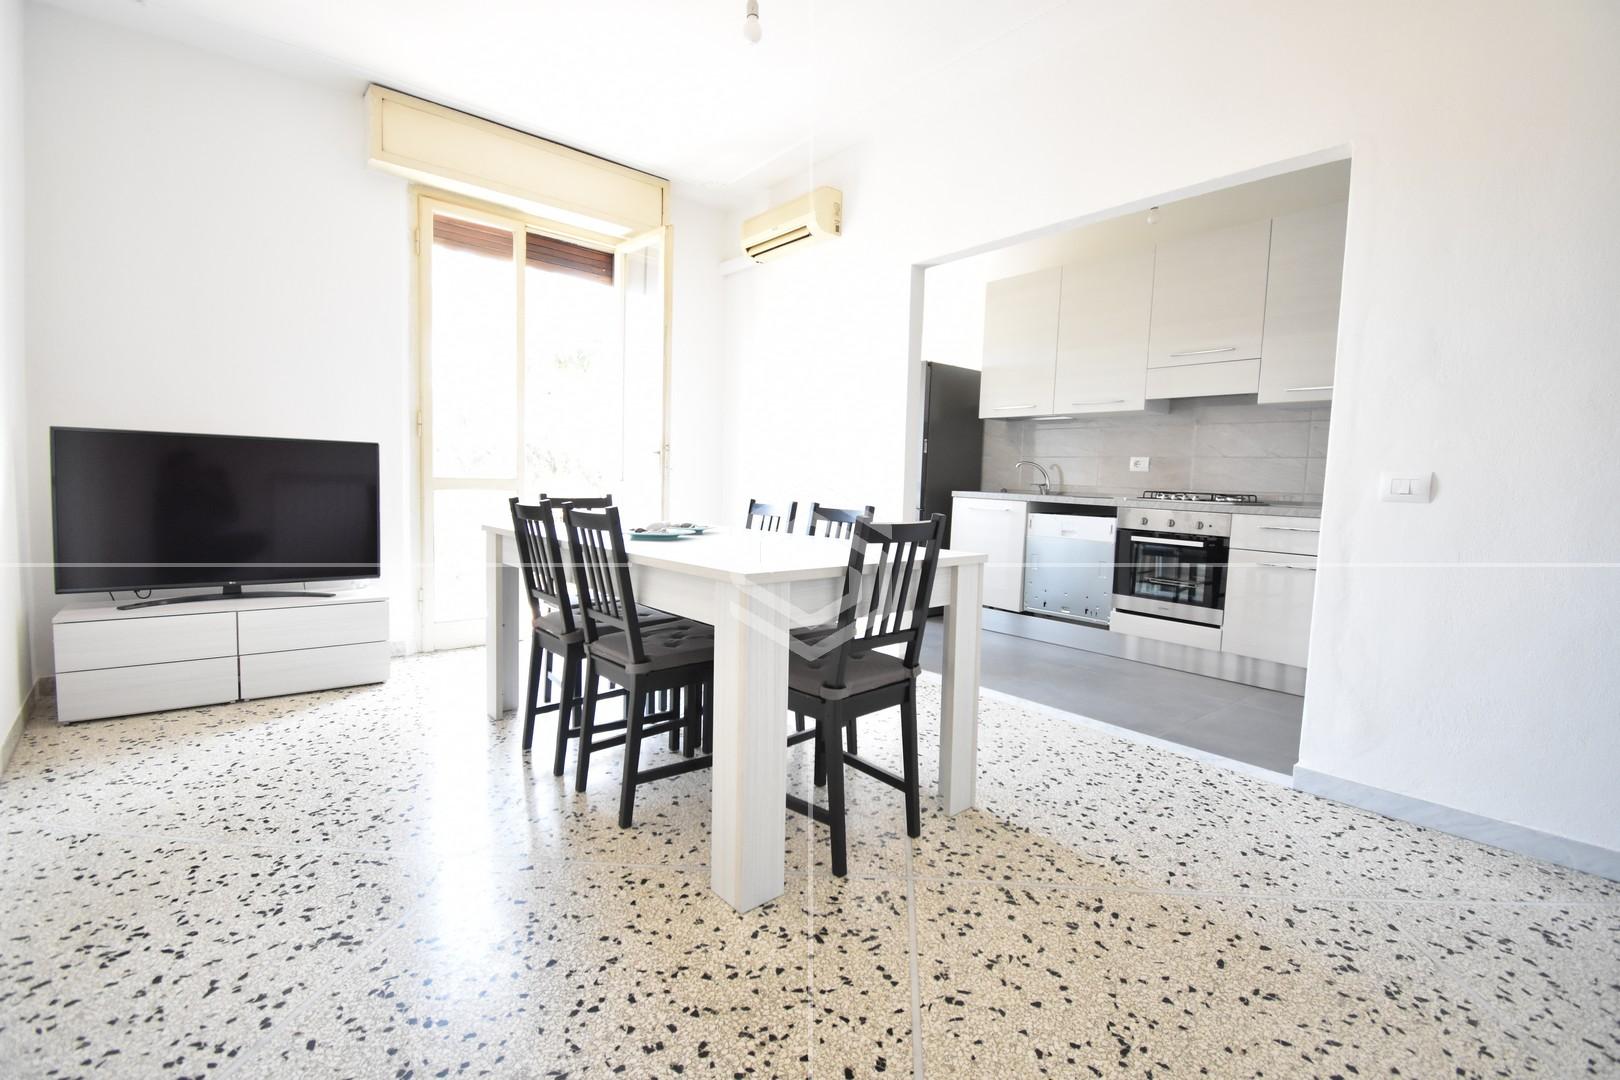 Affittasi camere in quadrilocale zona porta a Mare, Pisa.